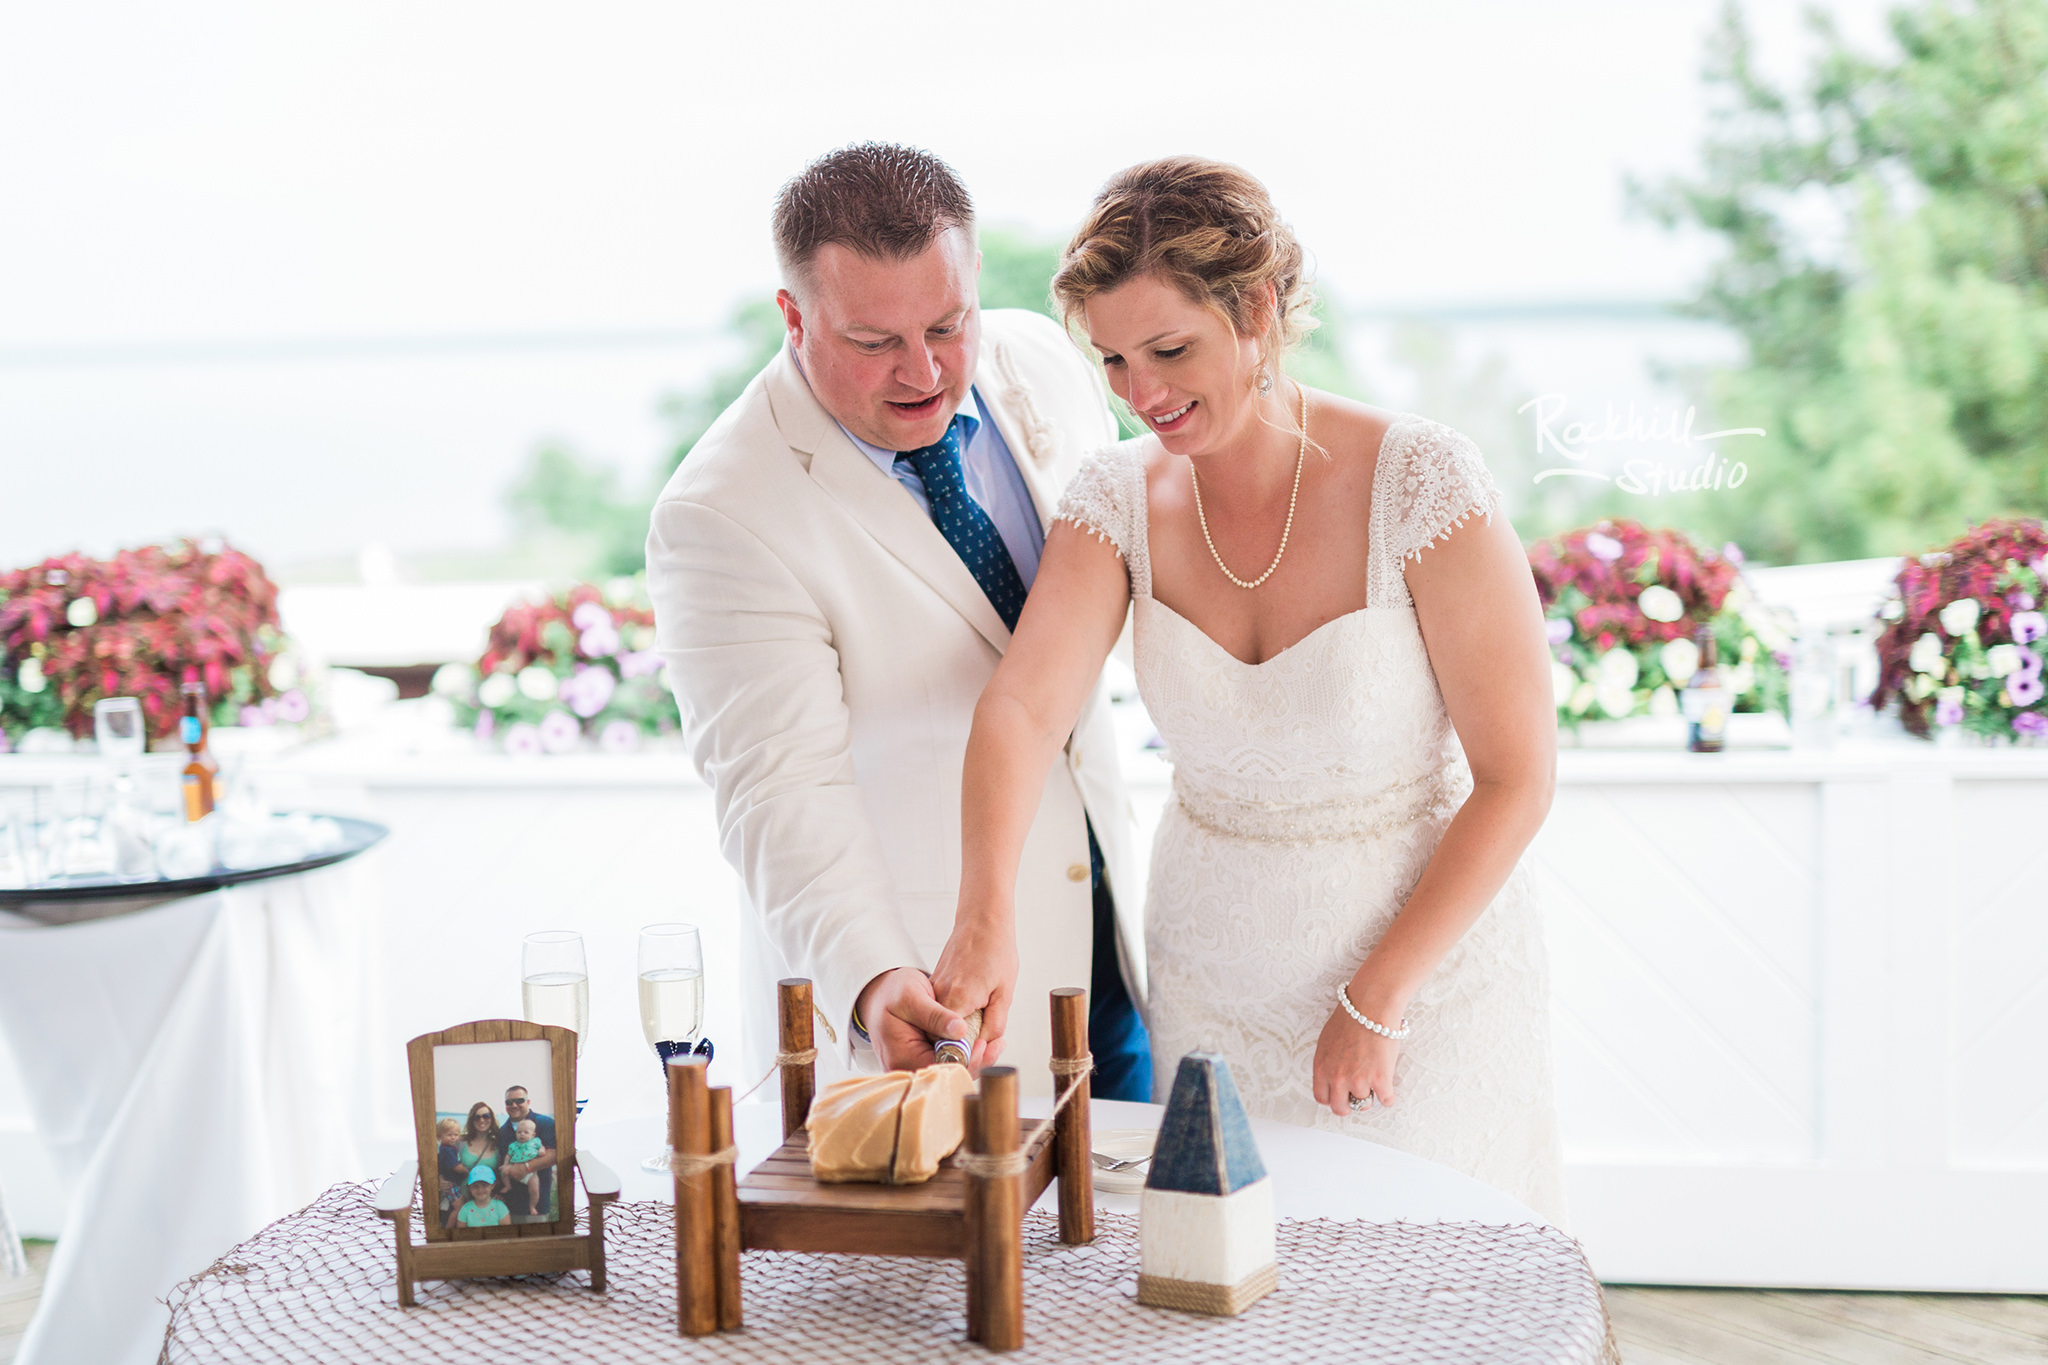 Mission Point Wedding, reception details, fudge cutting, Traverse City Wedding Photographer Rockhill Studio